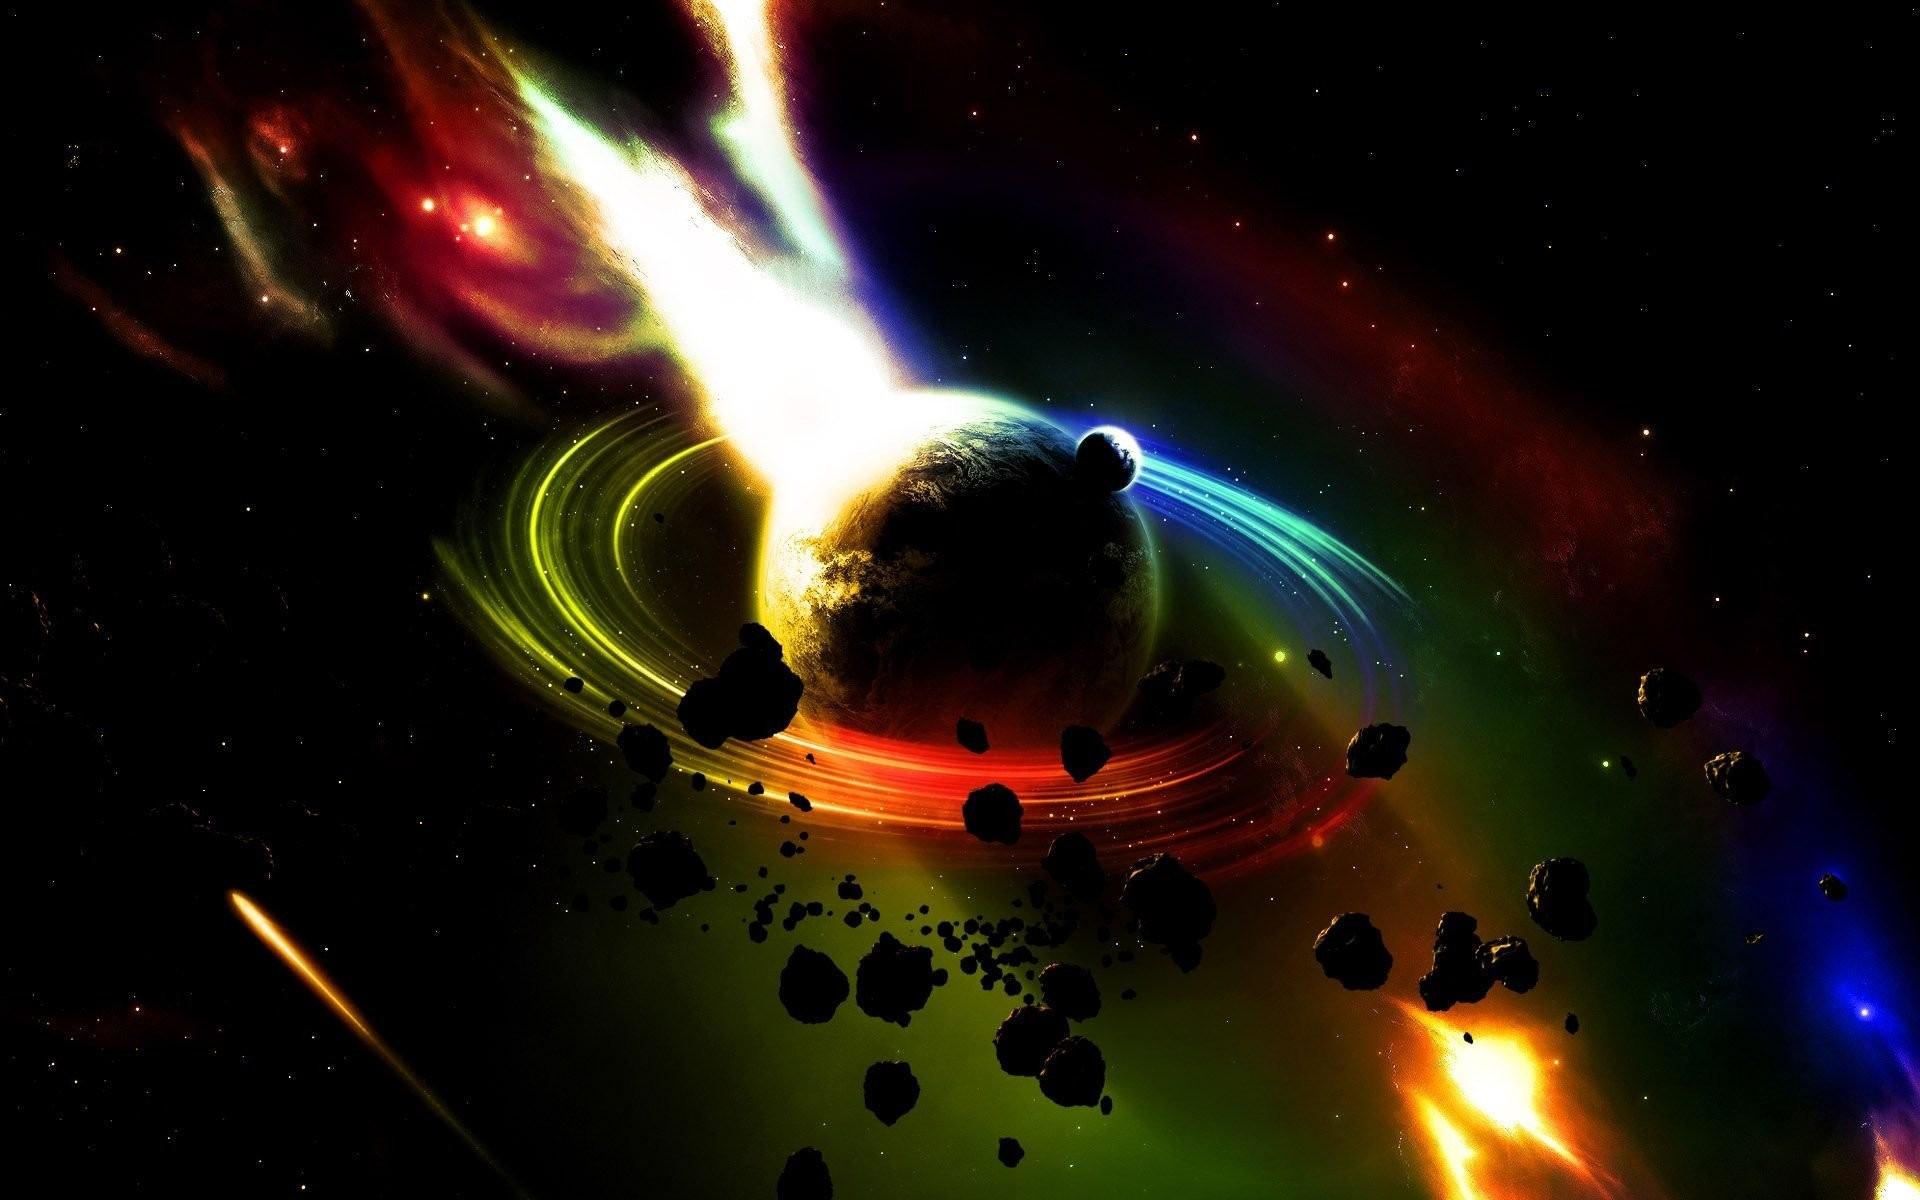 General 1920x1200 digital art CGI space universe planet stars comet meteors colorful explosion